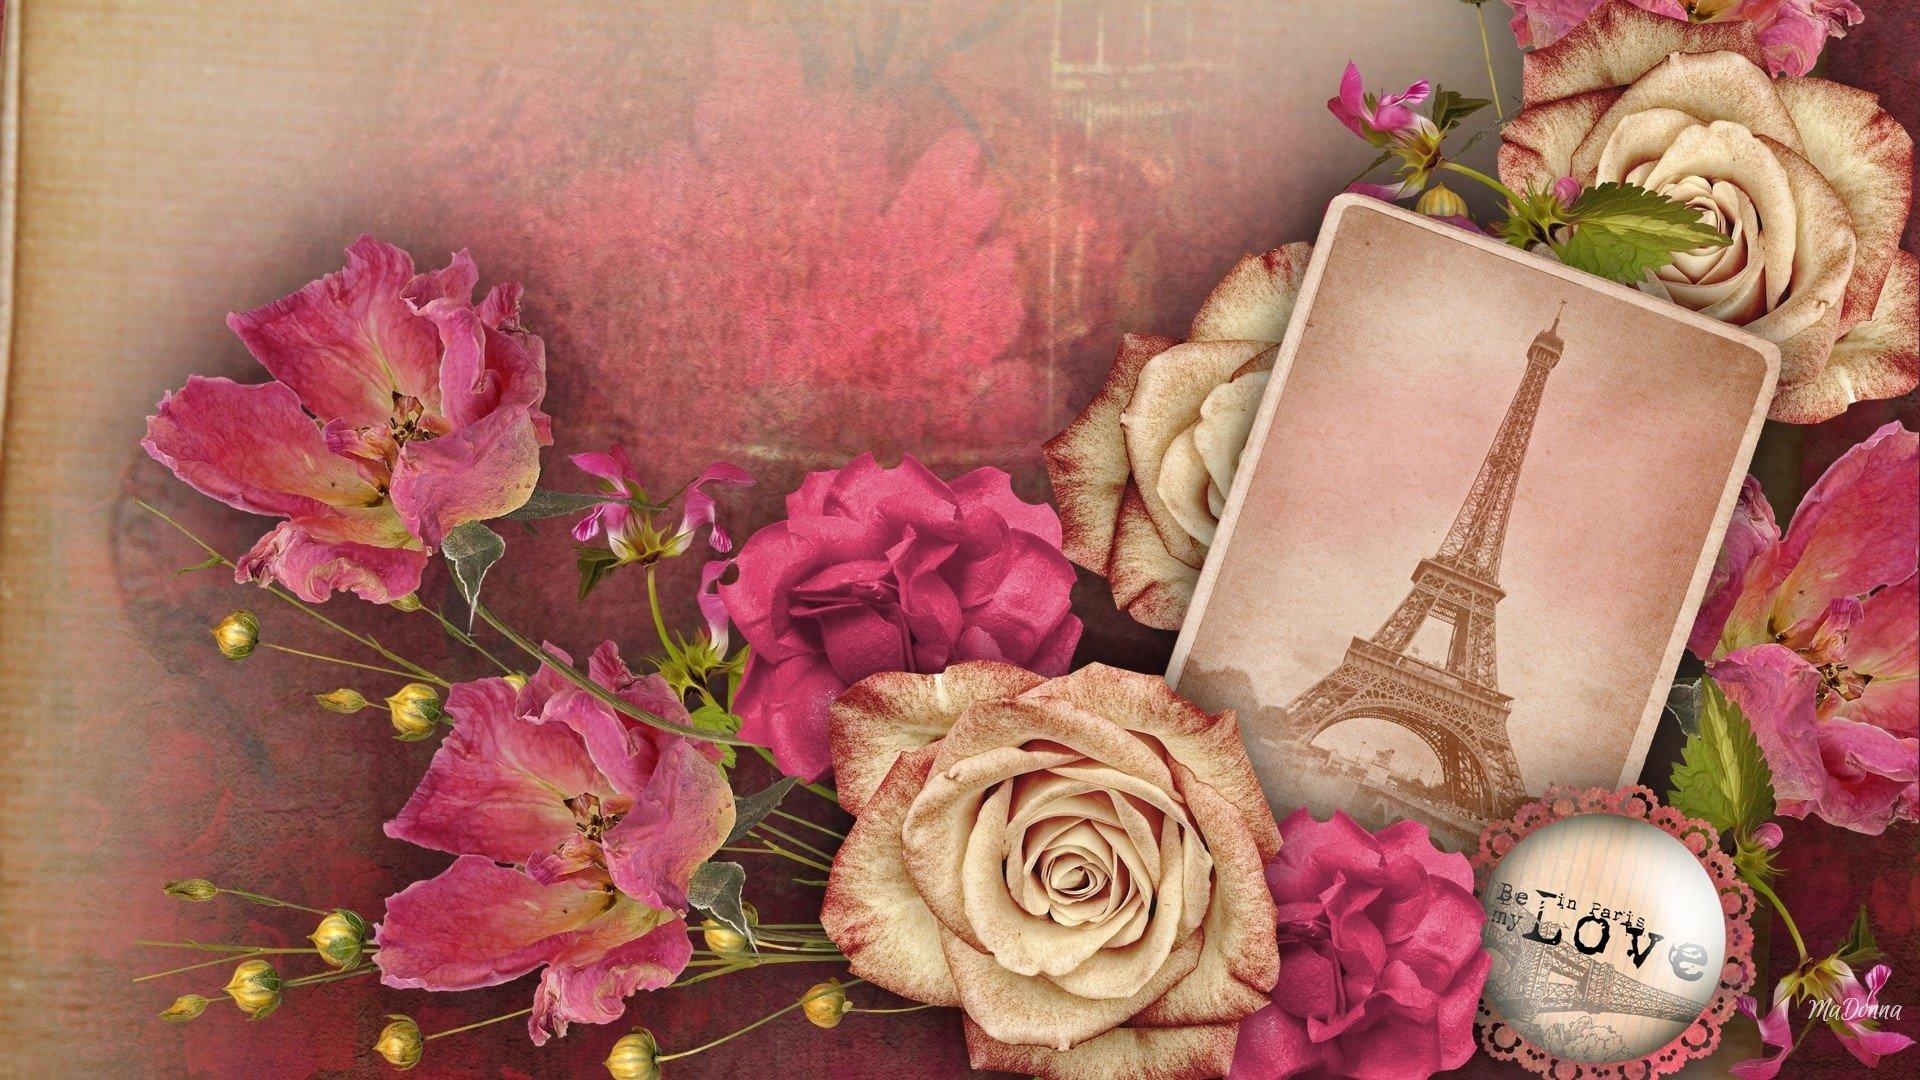 Memories Of Paris Full HD Fondo De Pantalla And Fondo De